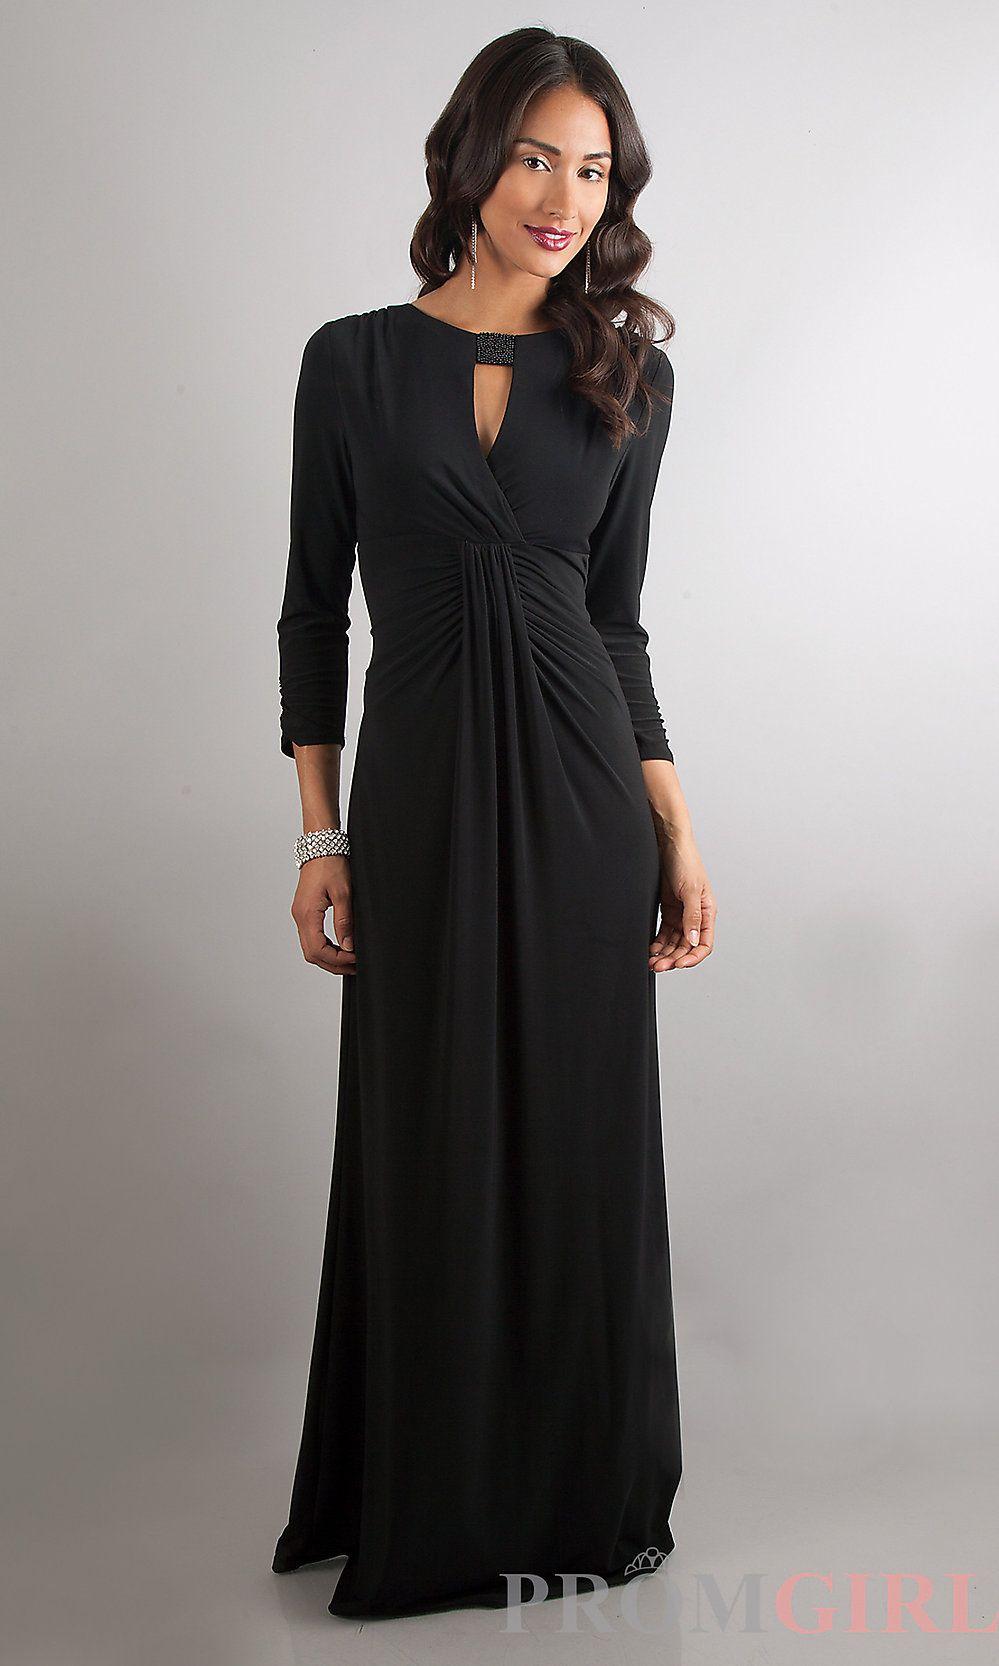 Classy black long dress loving the look dresses pinterest